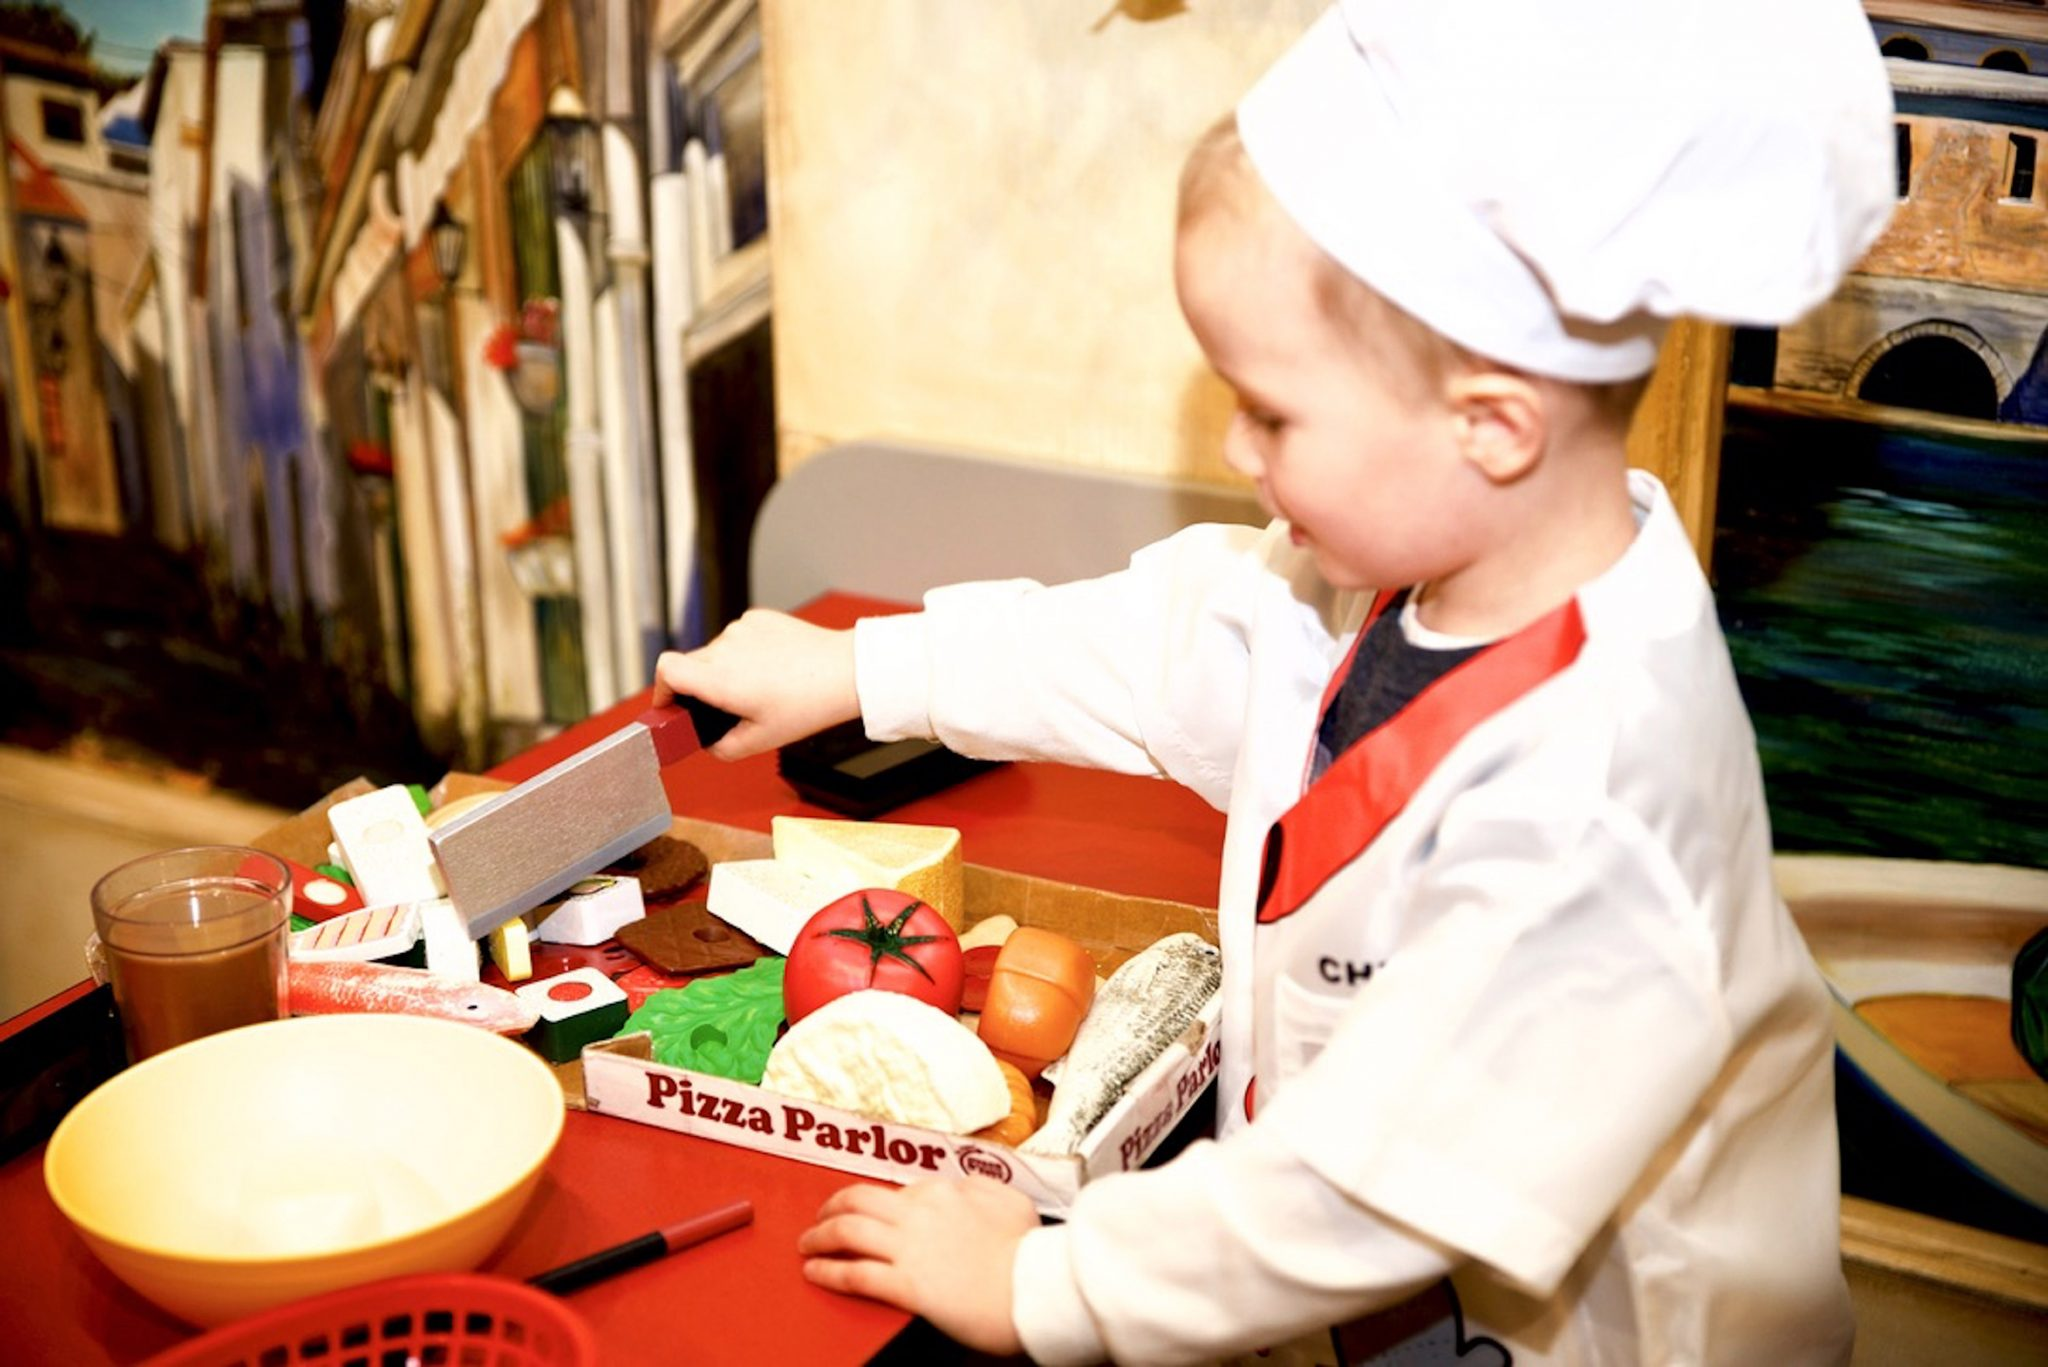 Play Café Exhibit Introduces International Tastes at The Woodlands Children's Museum